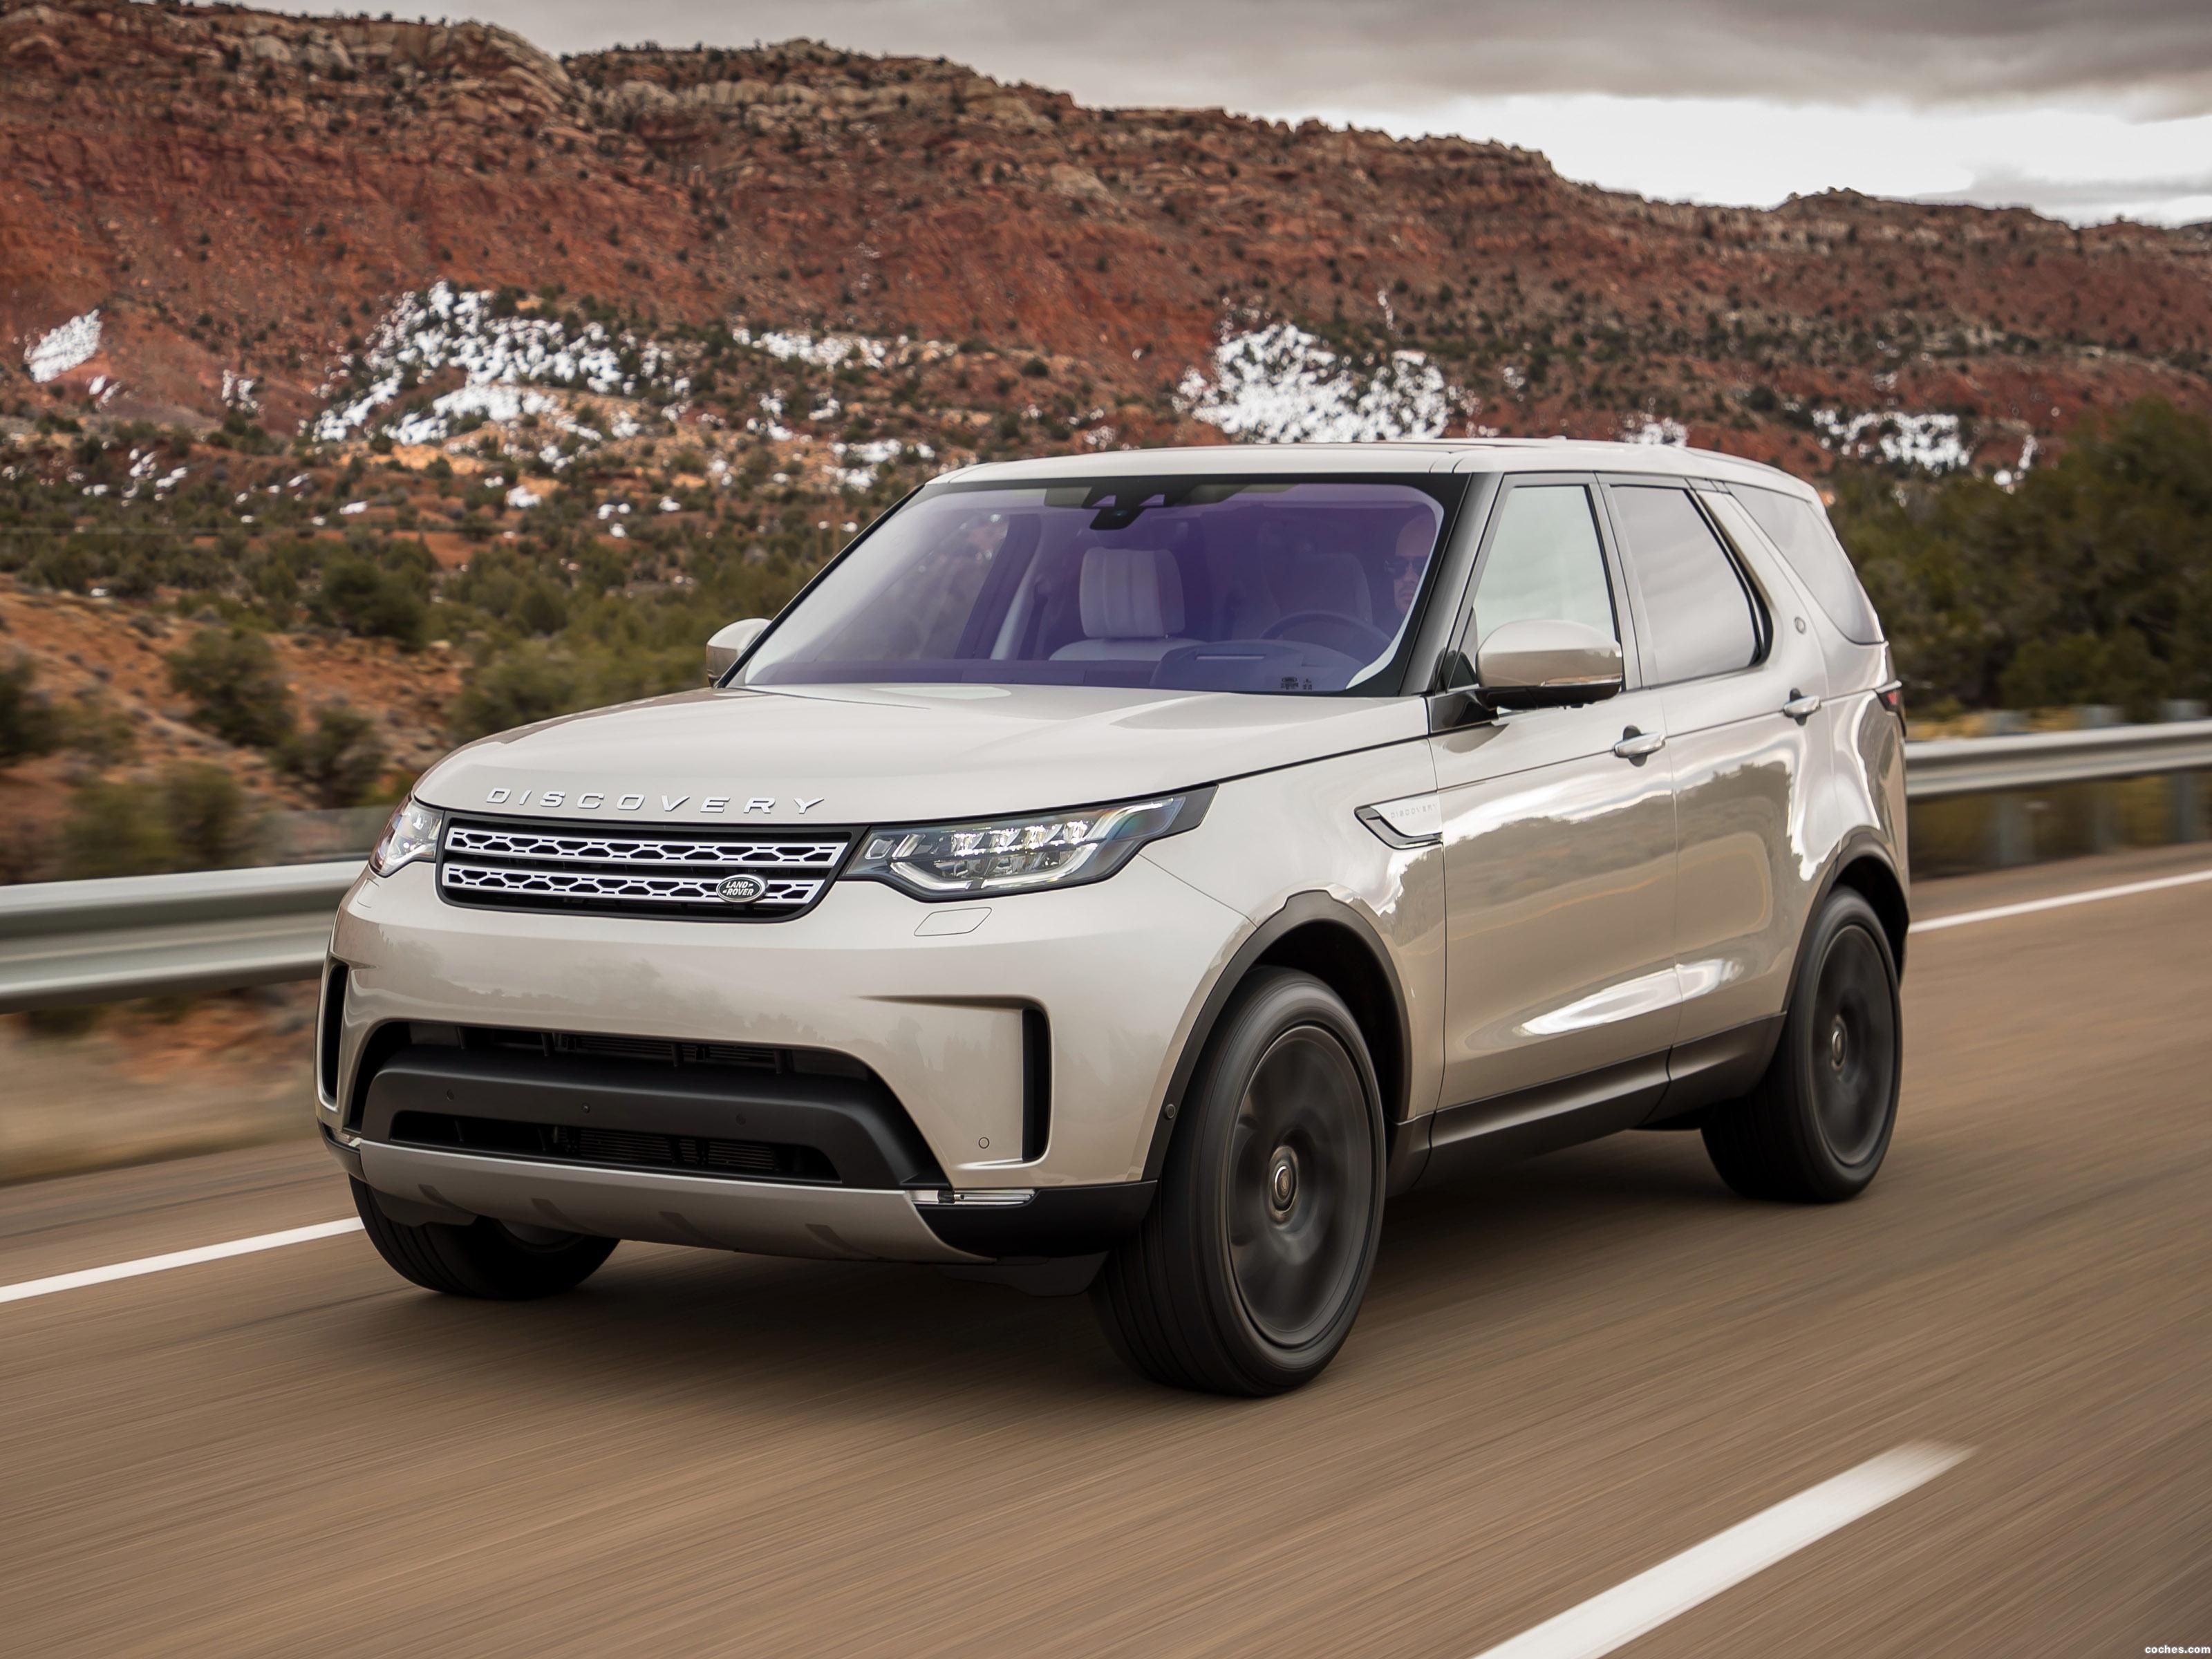 Foto 22 de Land Rover Discovery HSE 2017